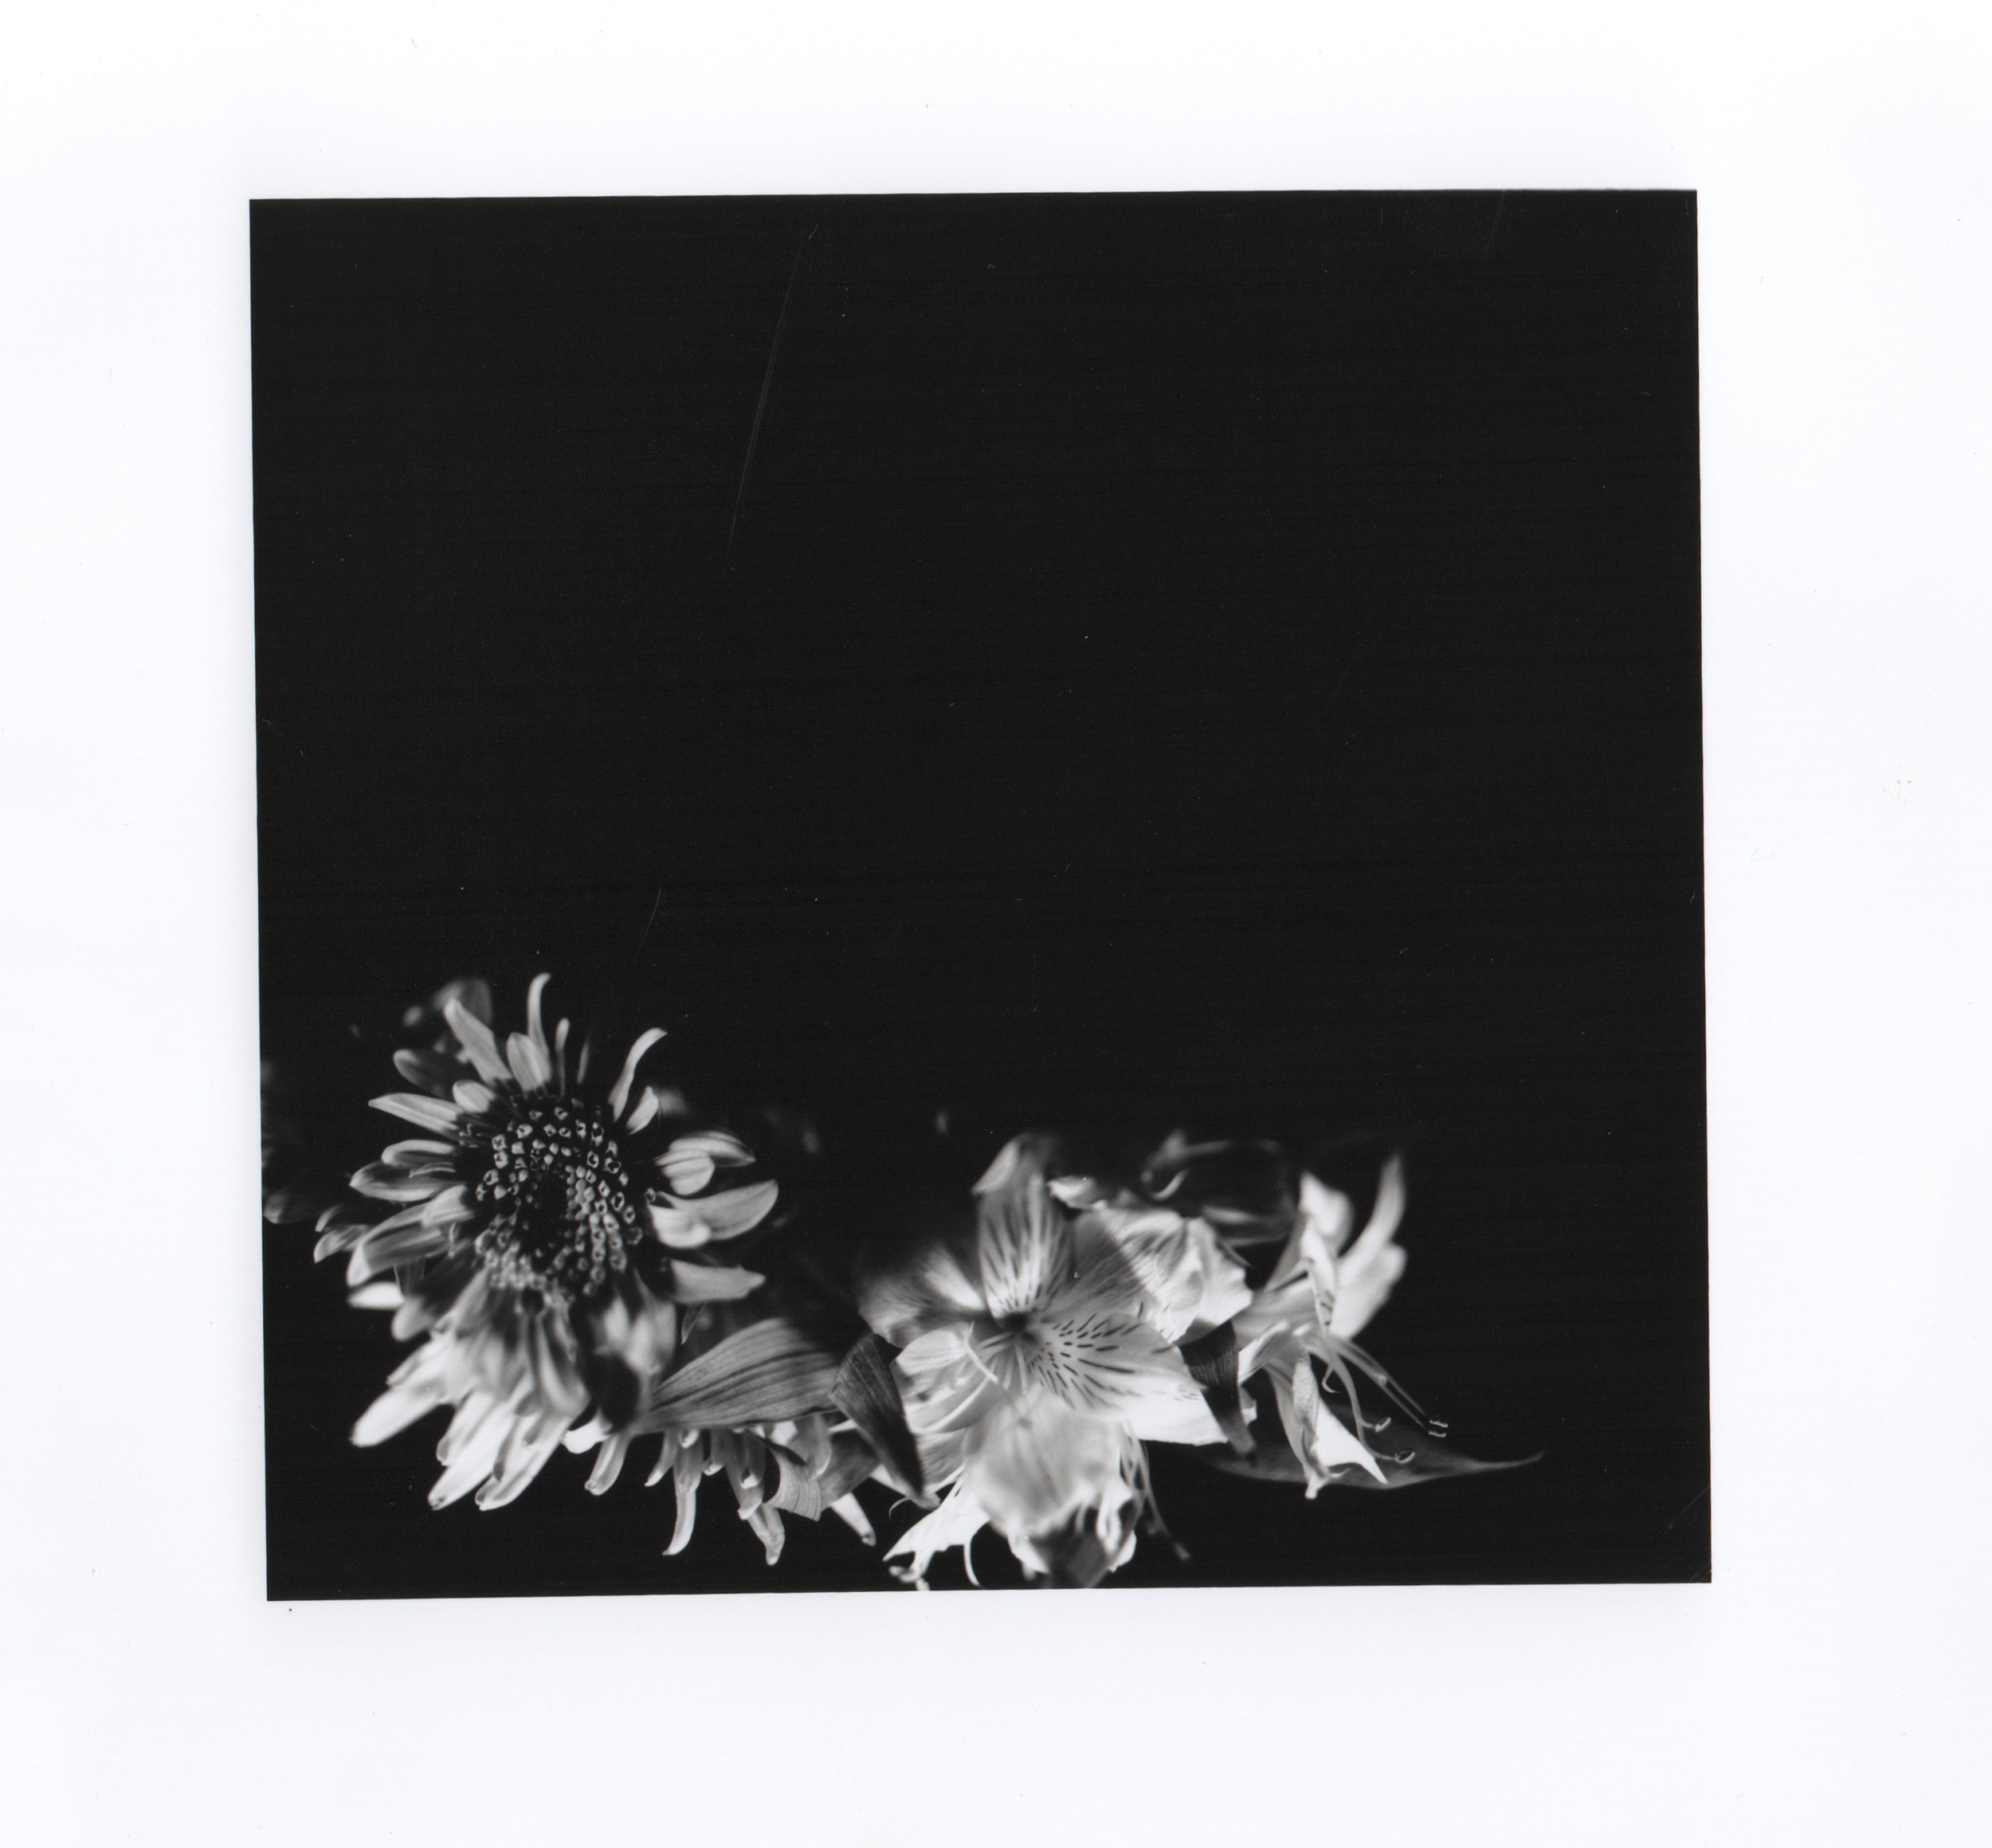 Flower 4x5 1 CLEANED.jpeg